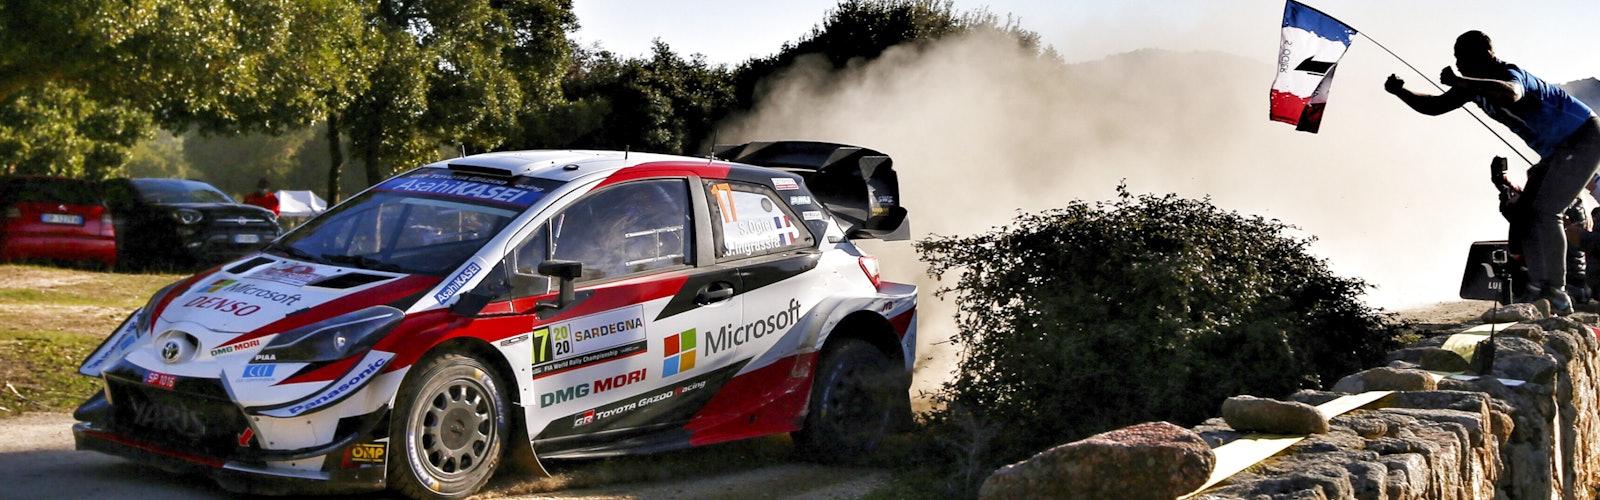 WRC_2020_Rd.6_134